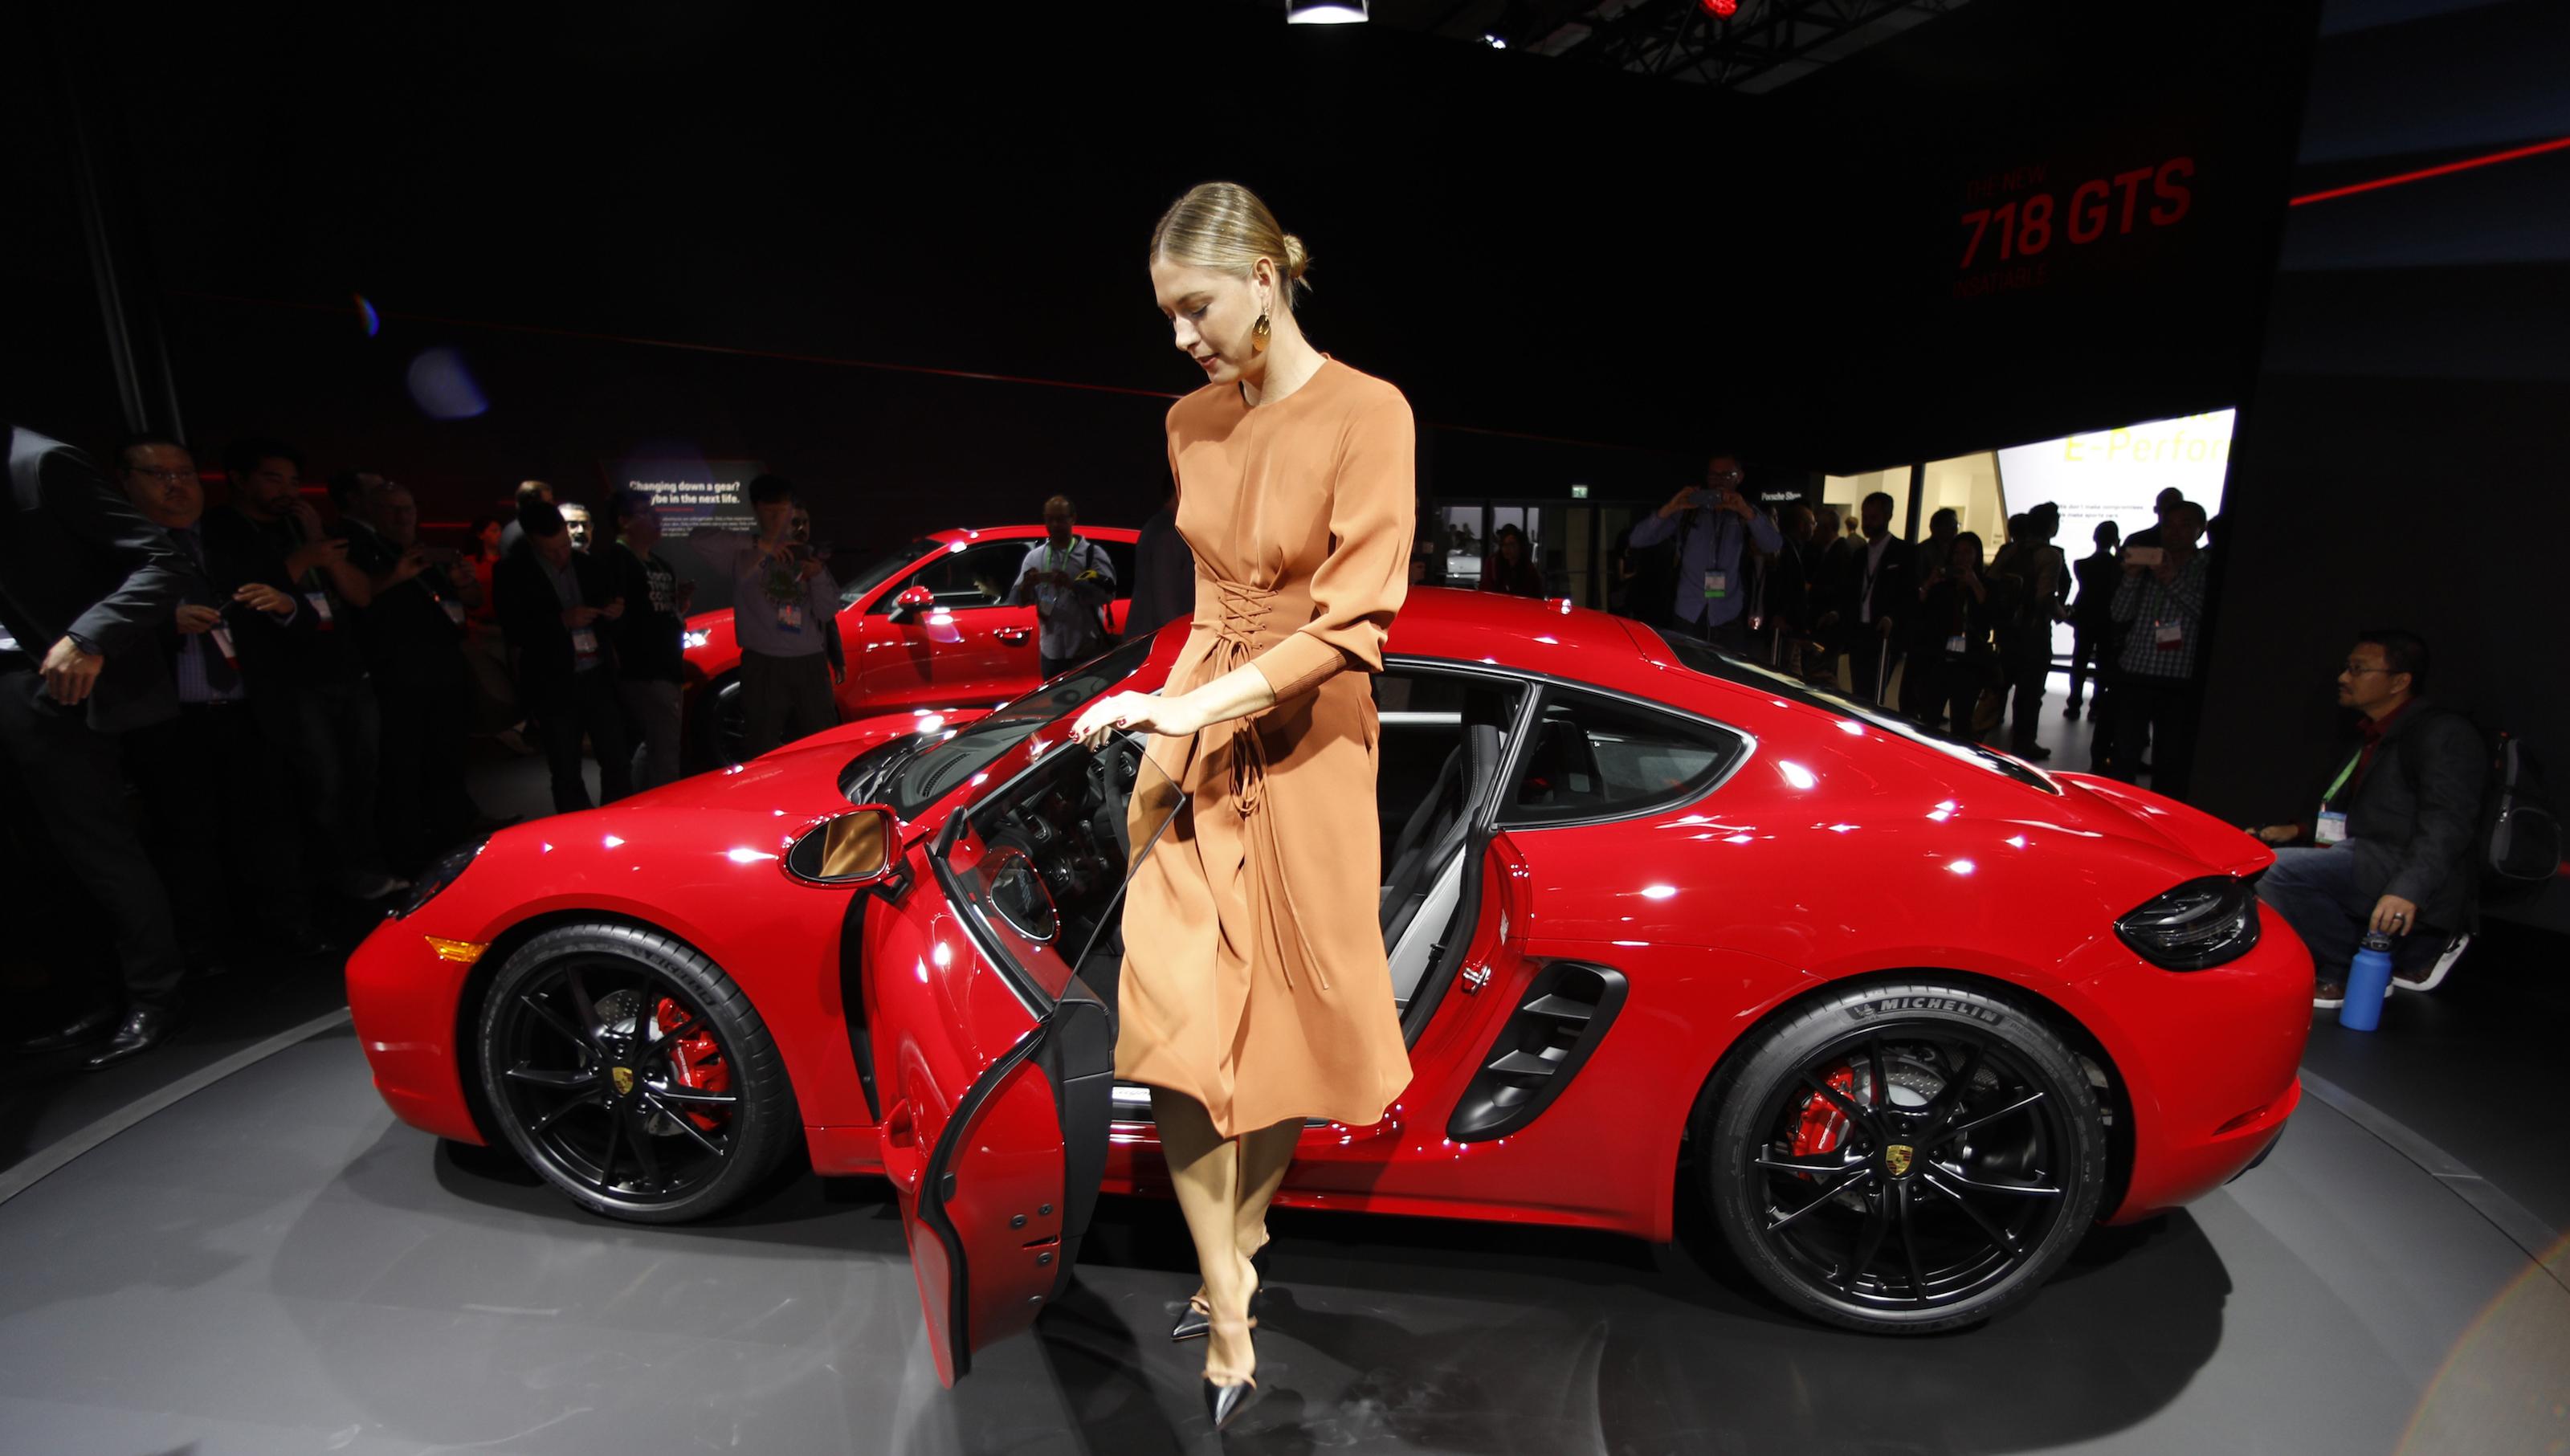 Professional tennis player Maria Sharapova poses next to a Porsche 718 Cayman GTS at the Los Angeles Auto Show in Los Angeles, California U.S. November 29, 2017. REUTERS/Mike Blake - HP1EDBT1JJ96Z